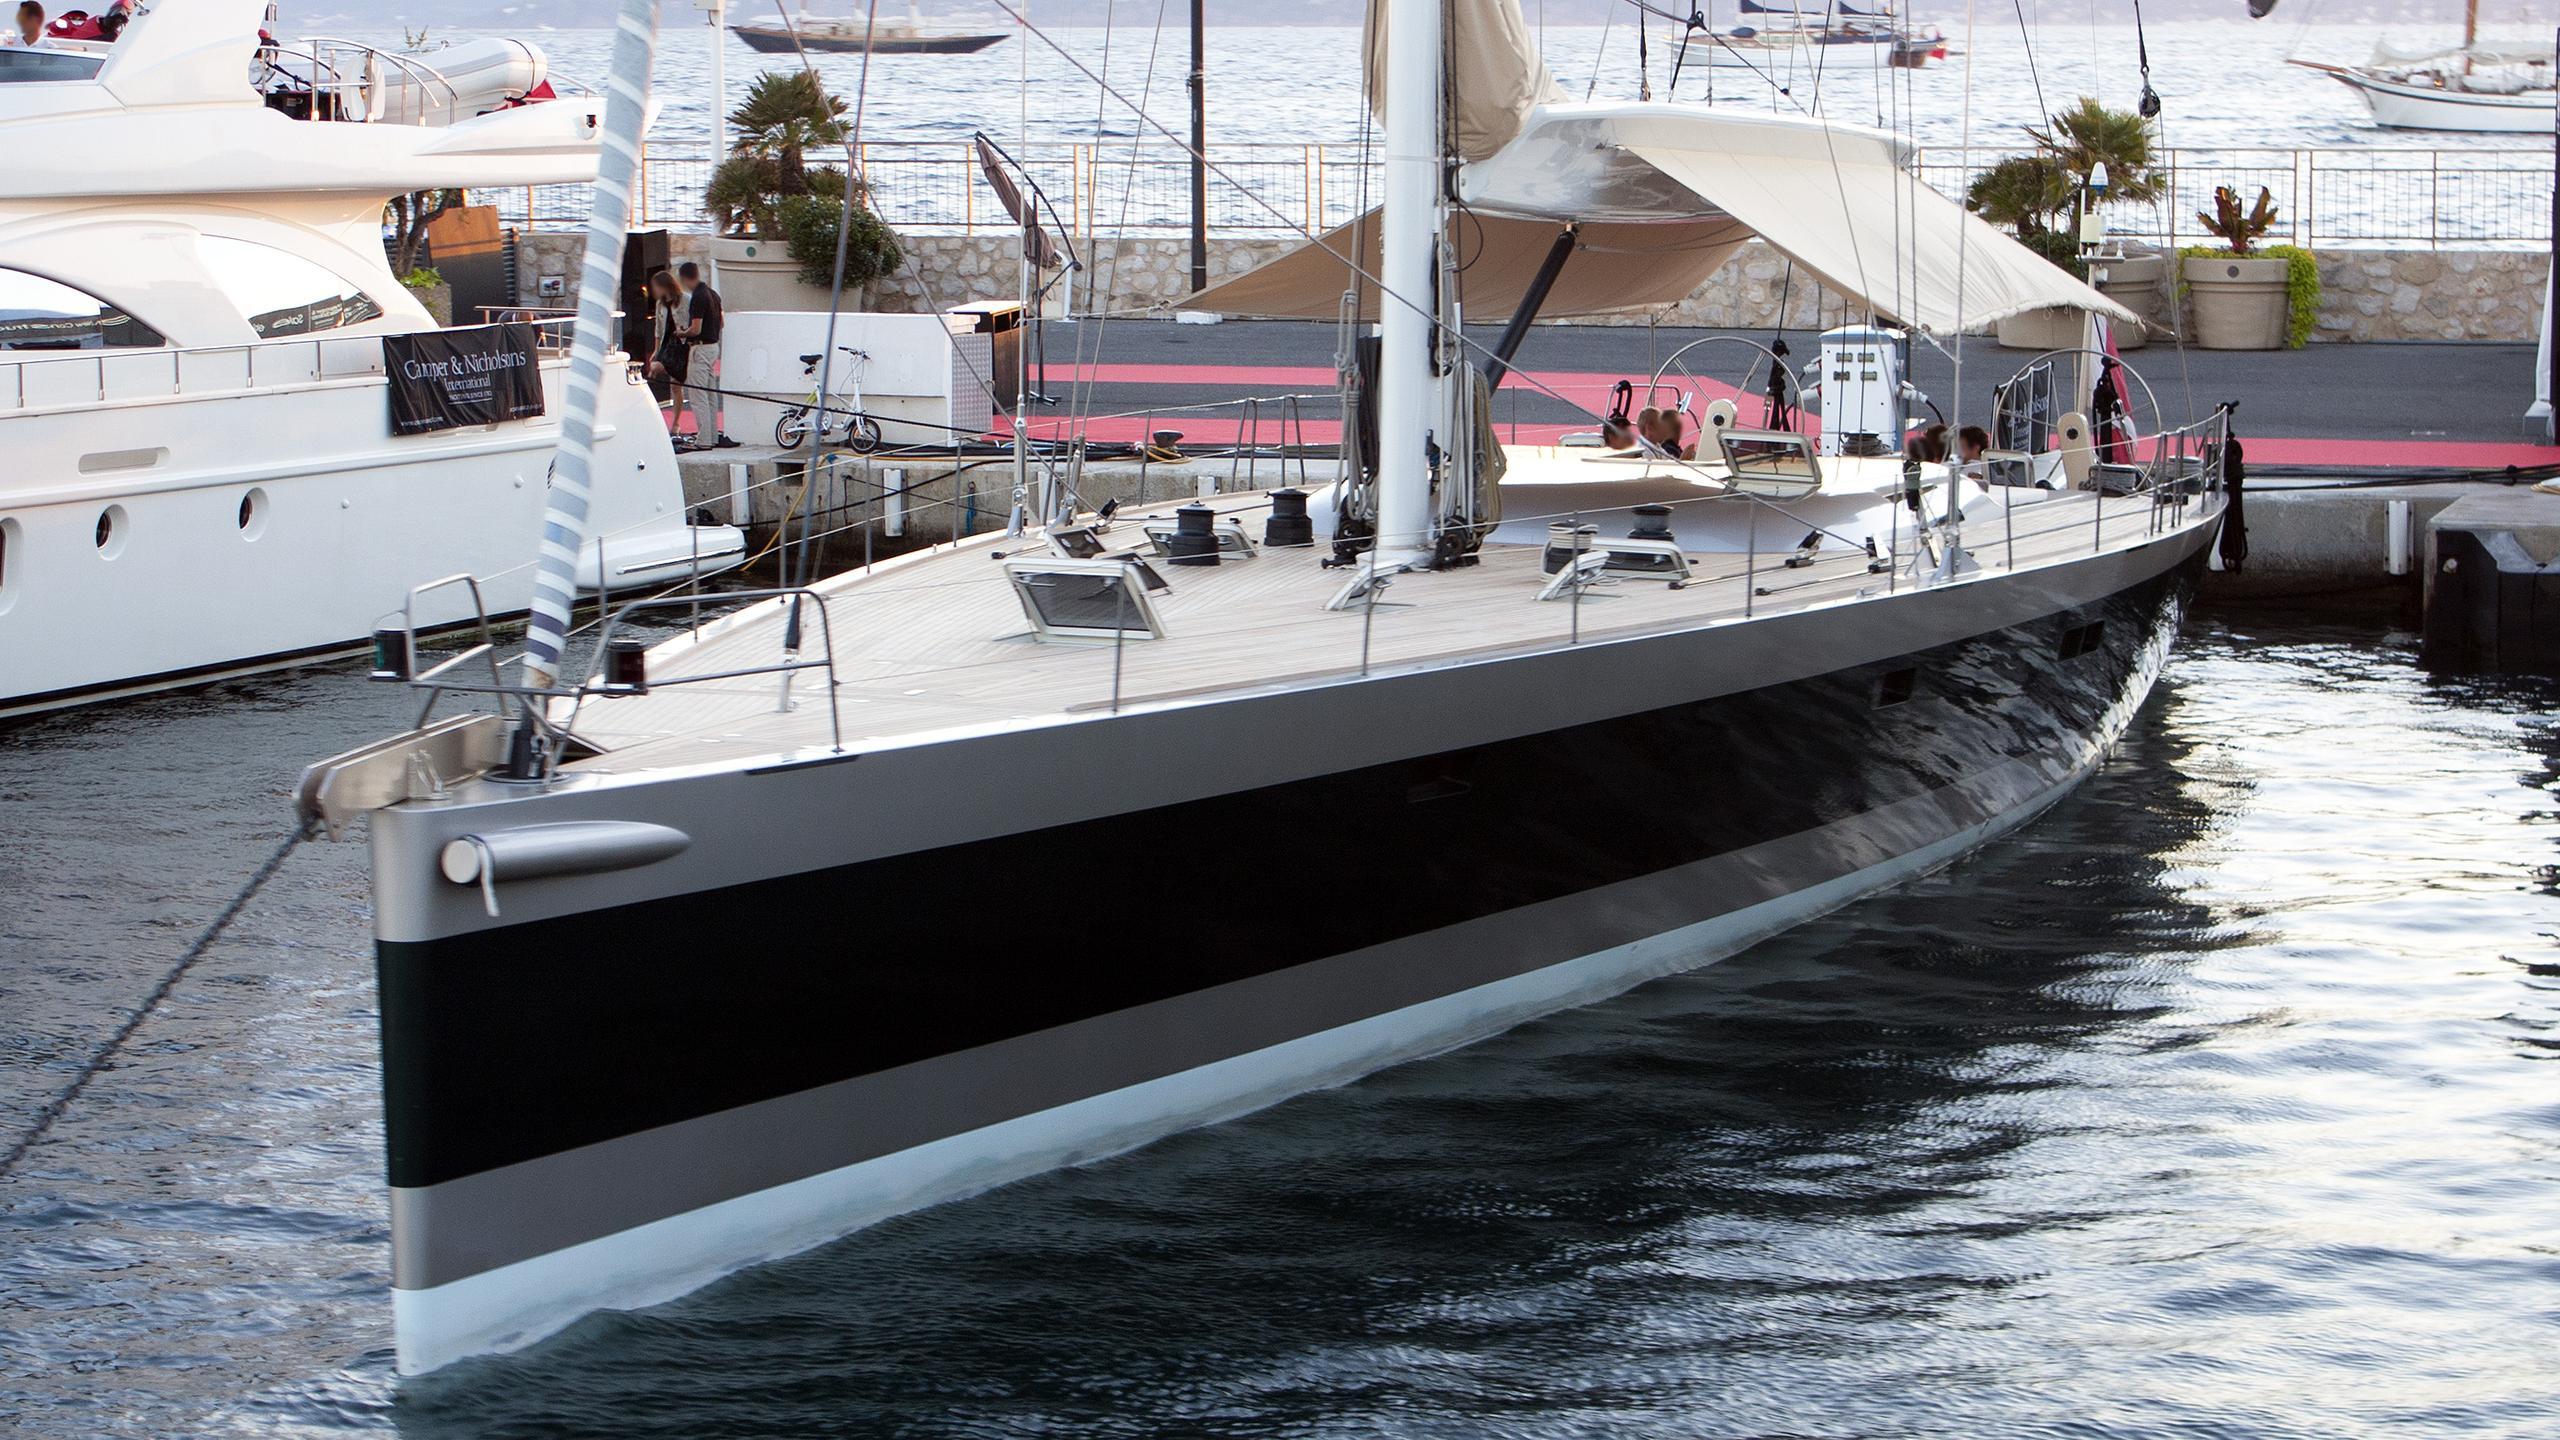 zurbagan-sailing-yacht-garcia-2006-27m-half-profile